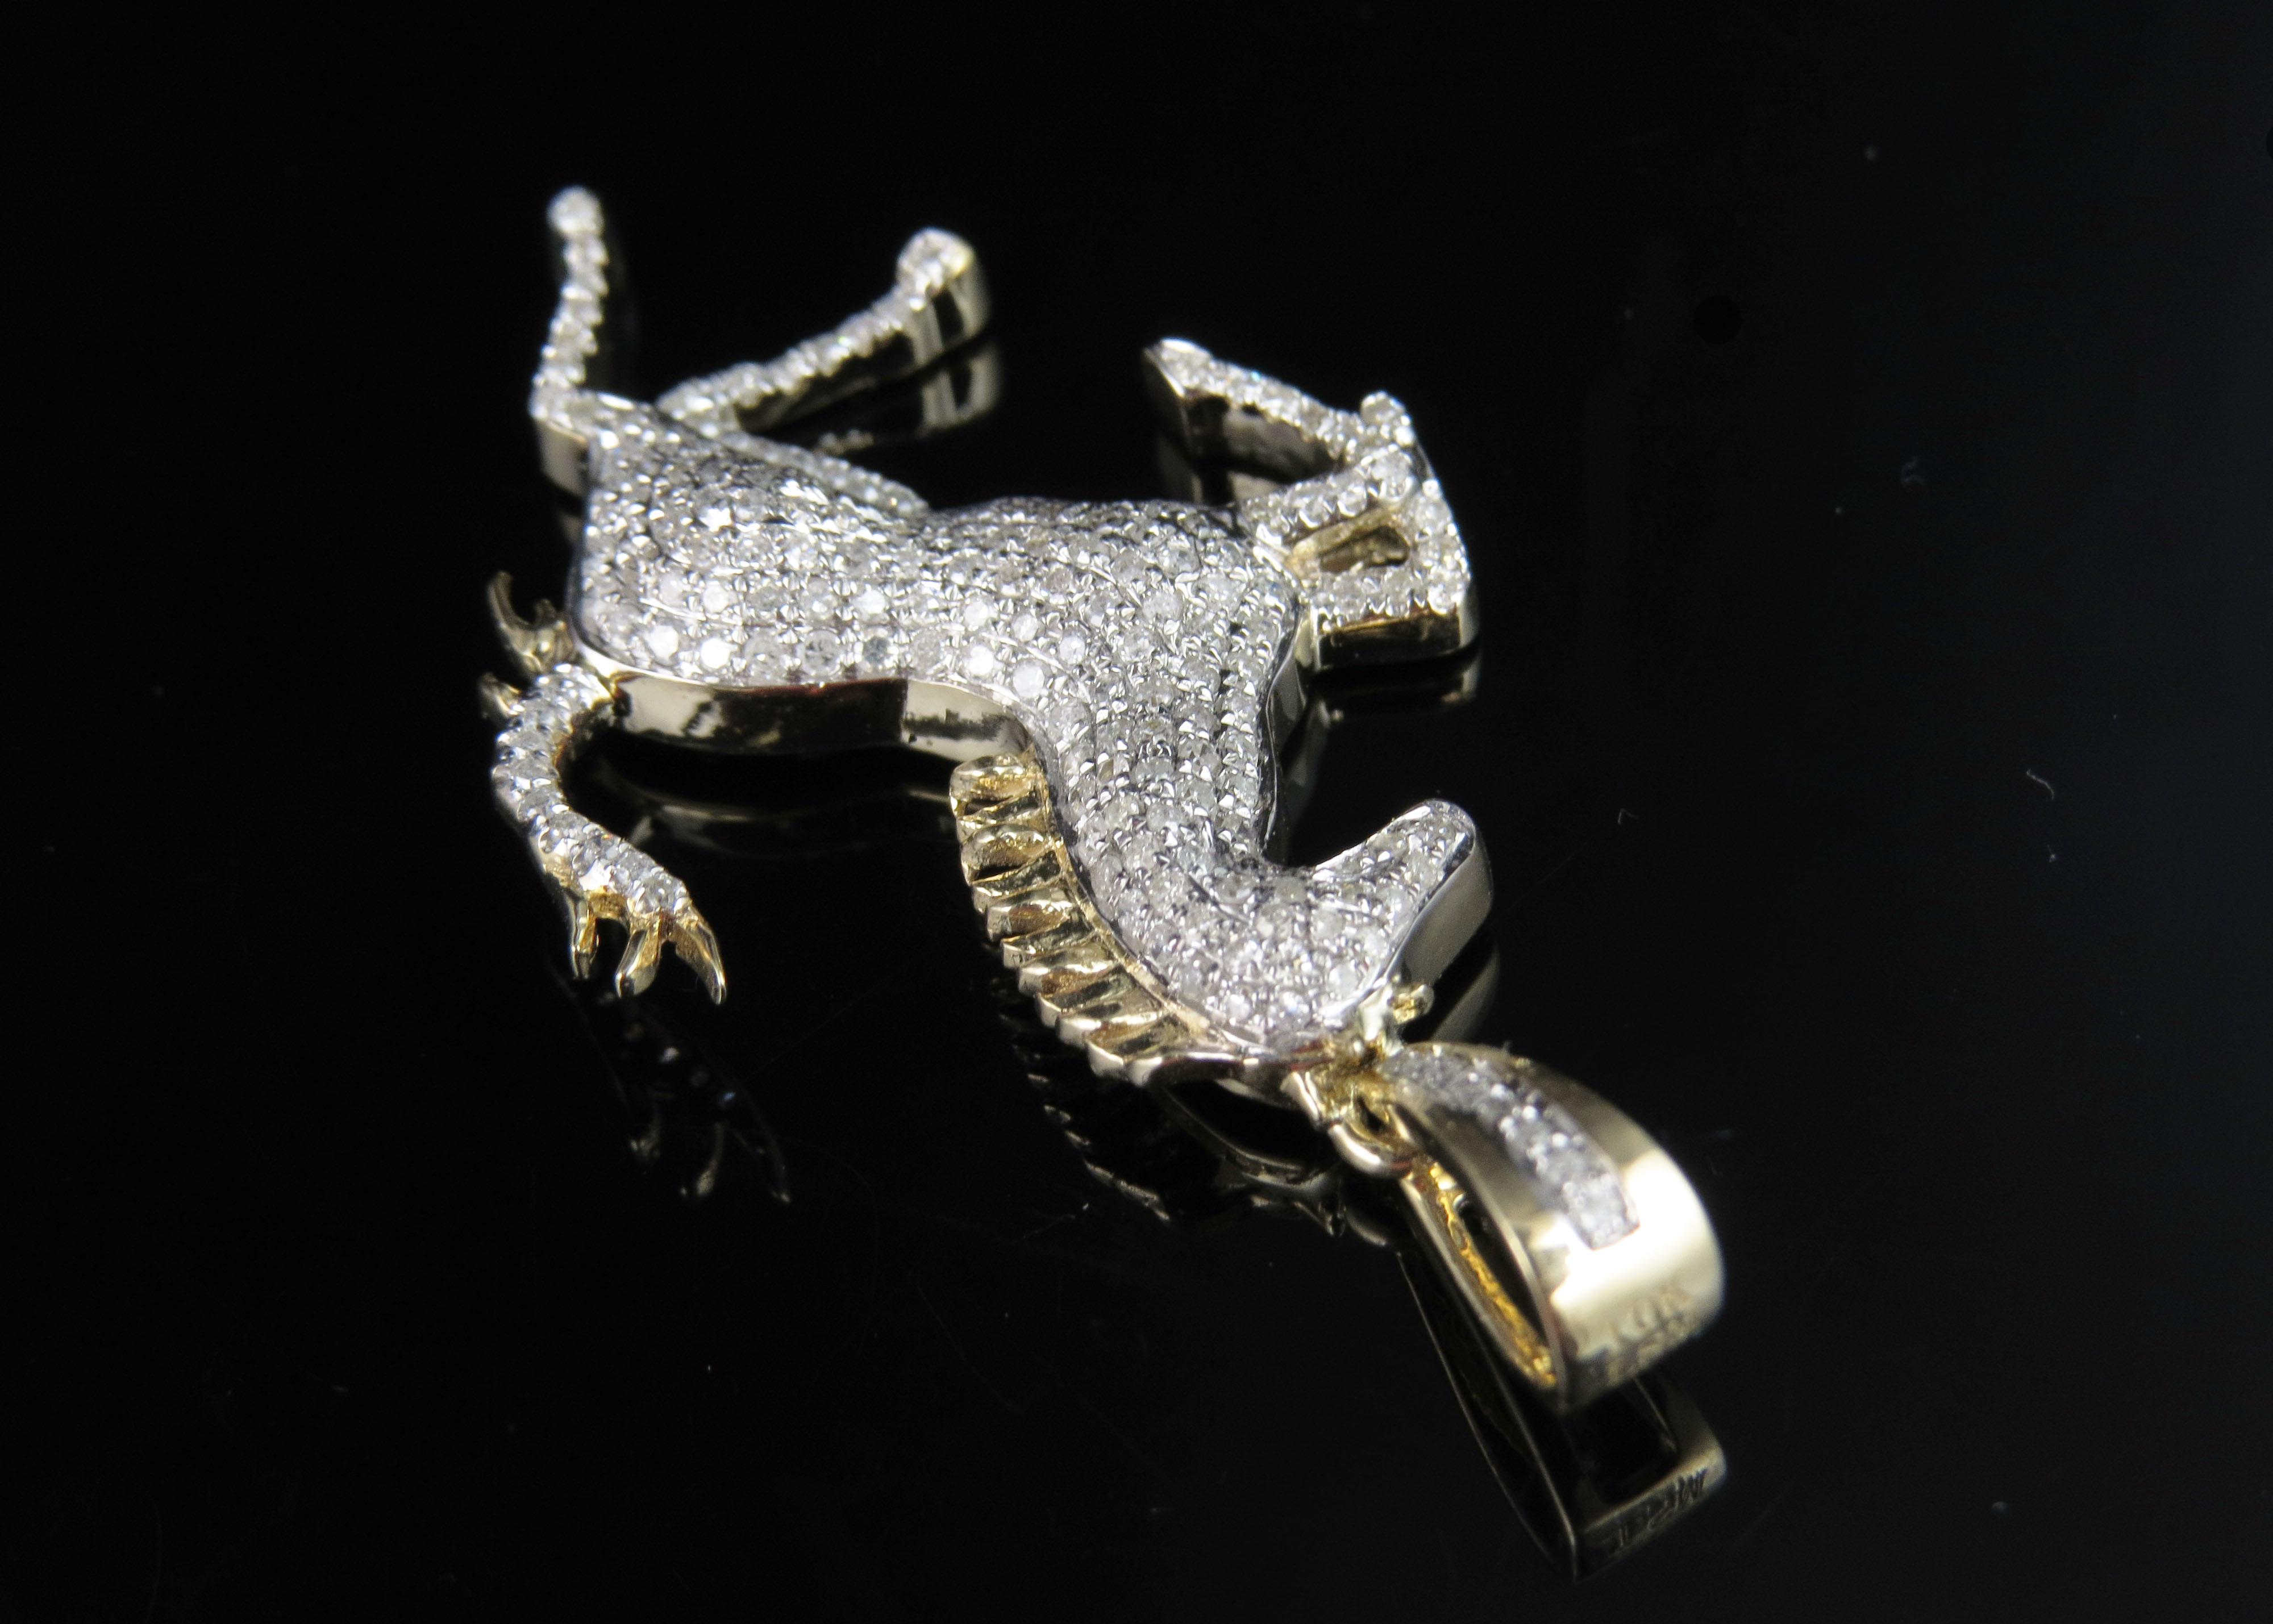 img horse gold itm necklace logo diamond inch charm pendant genuine ebay yellow ferrari